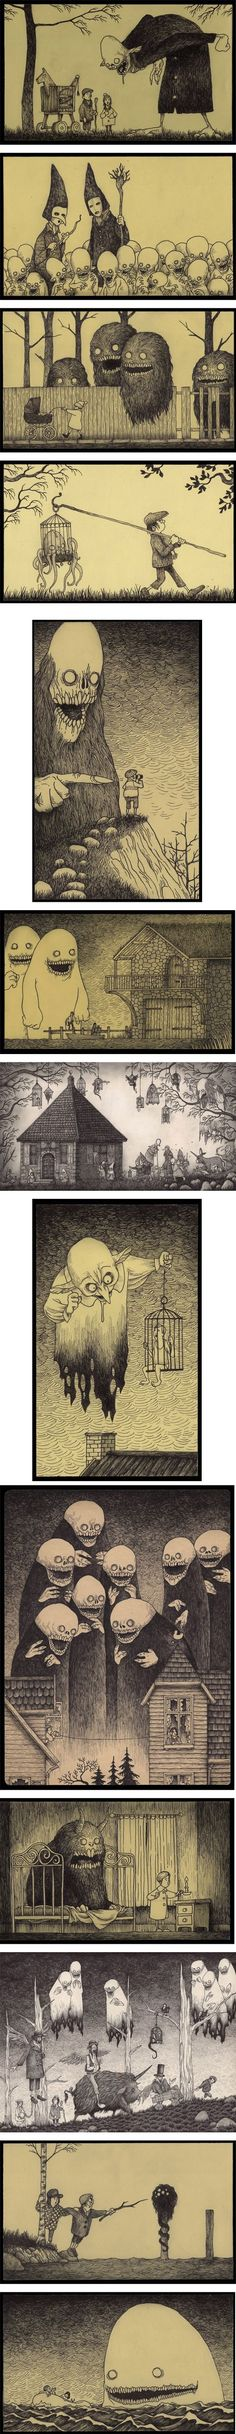 John #Kenn - Post-it Monstres: